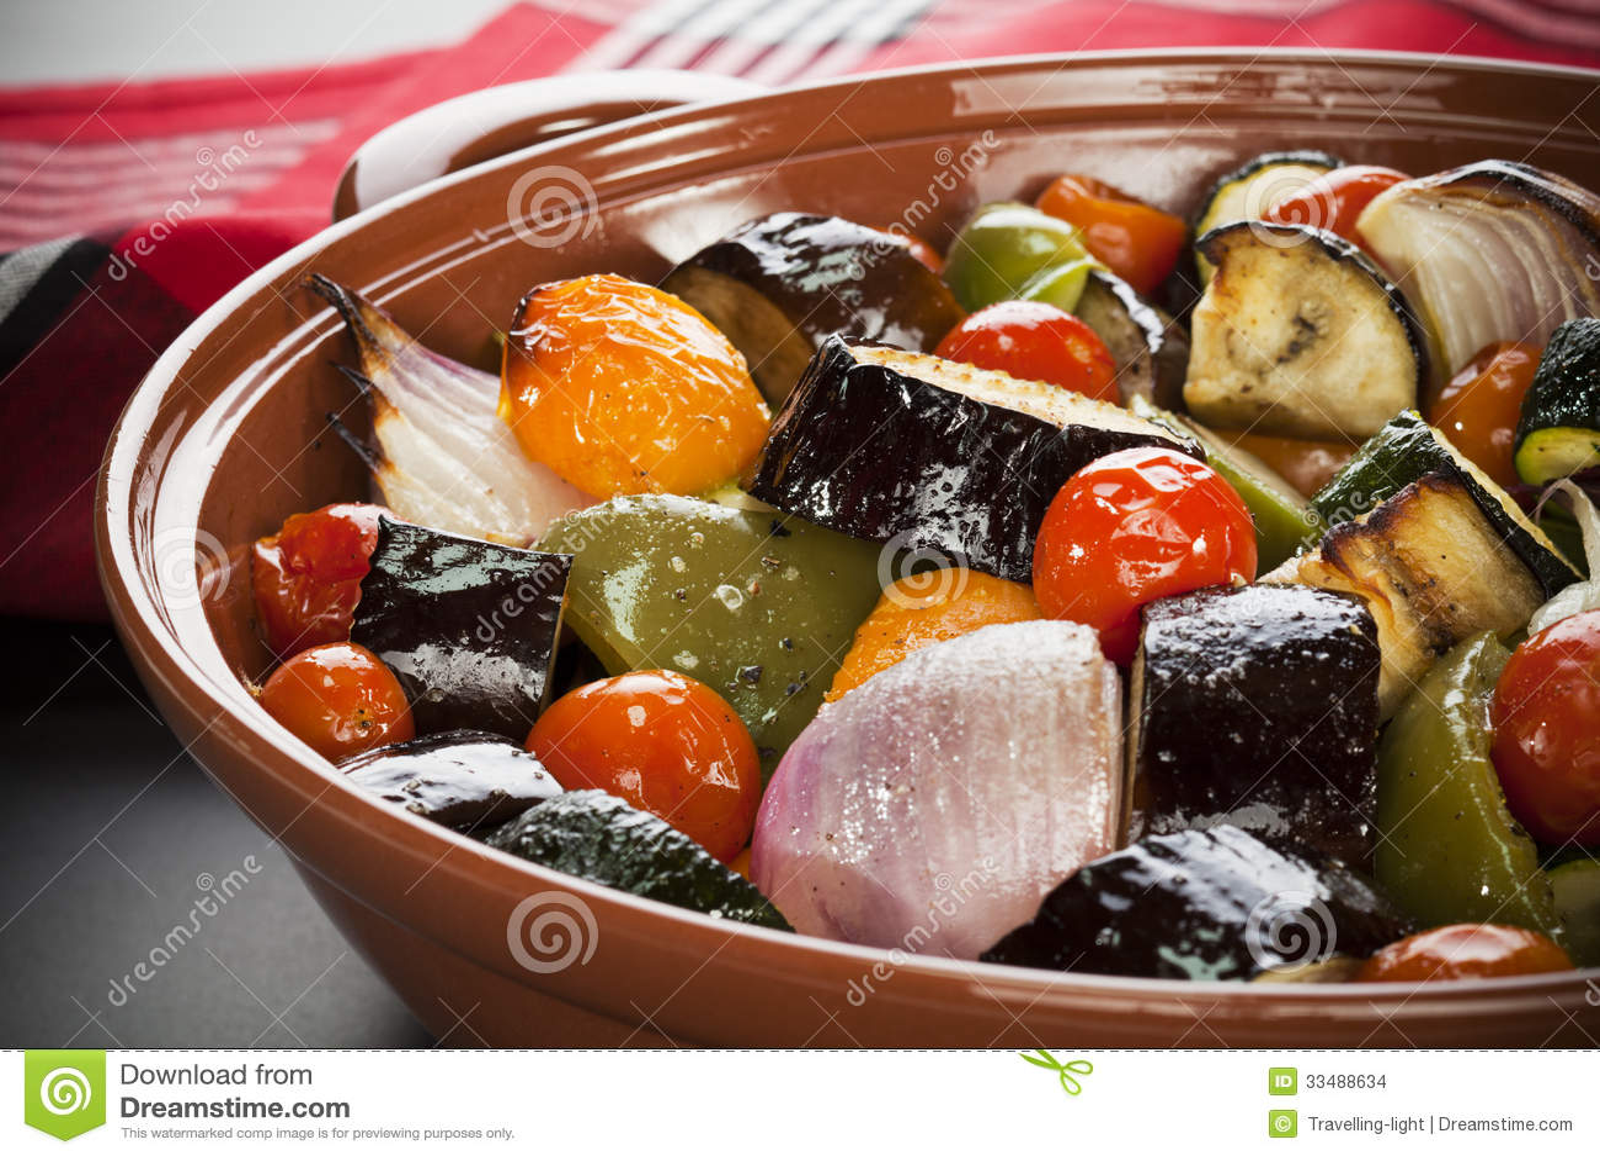 Mediterranean | nutritioneducationstore.com